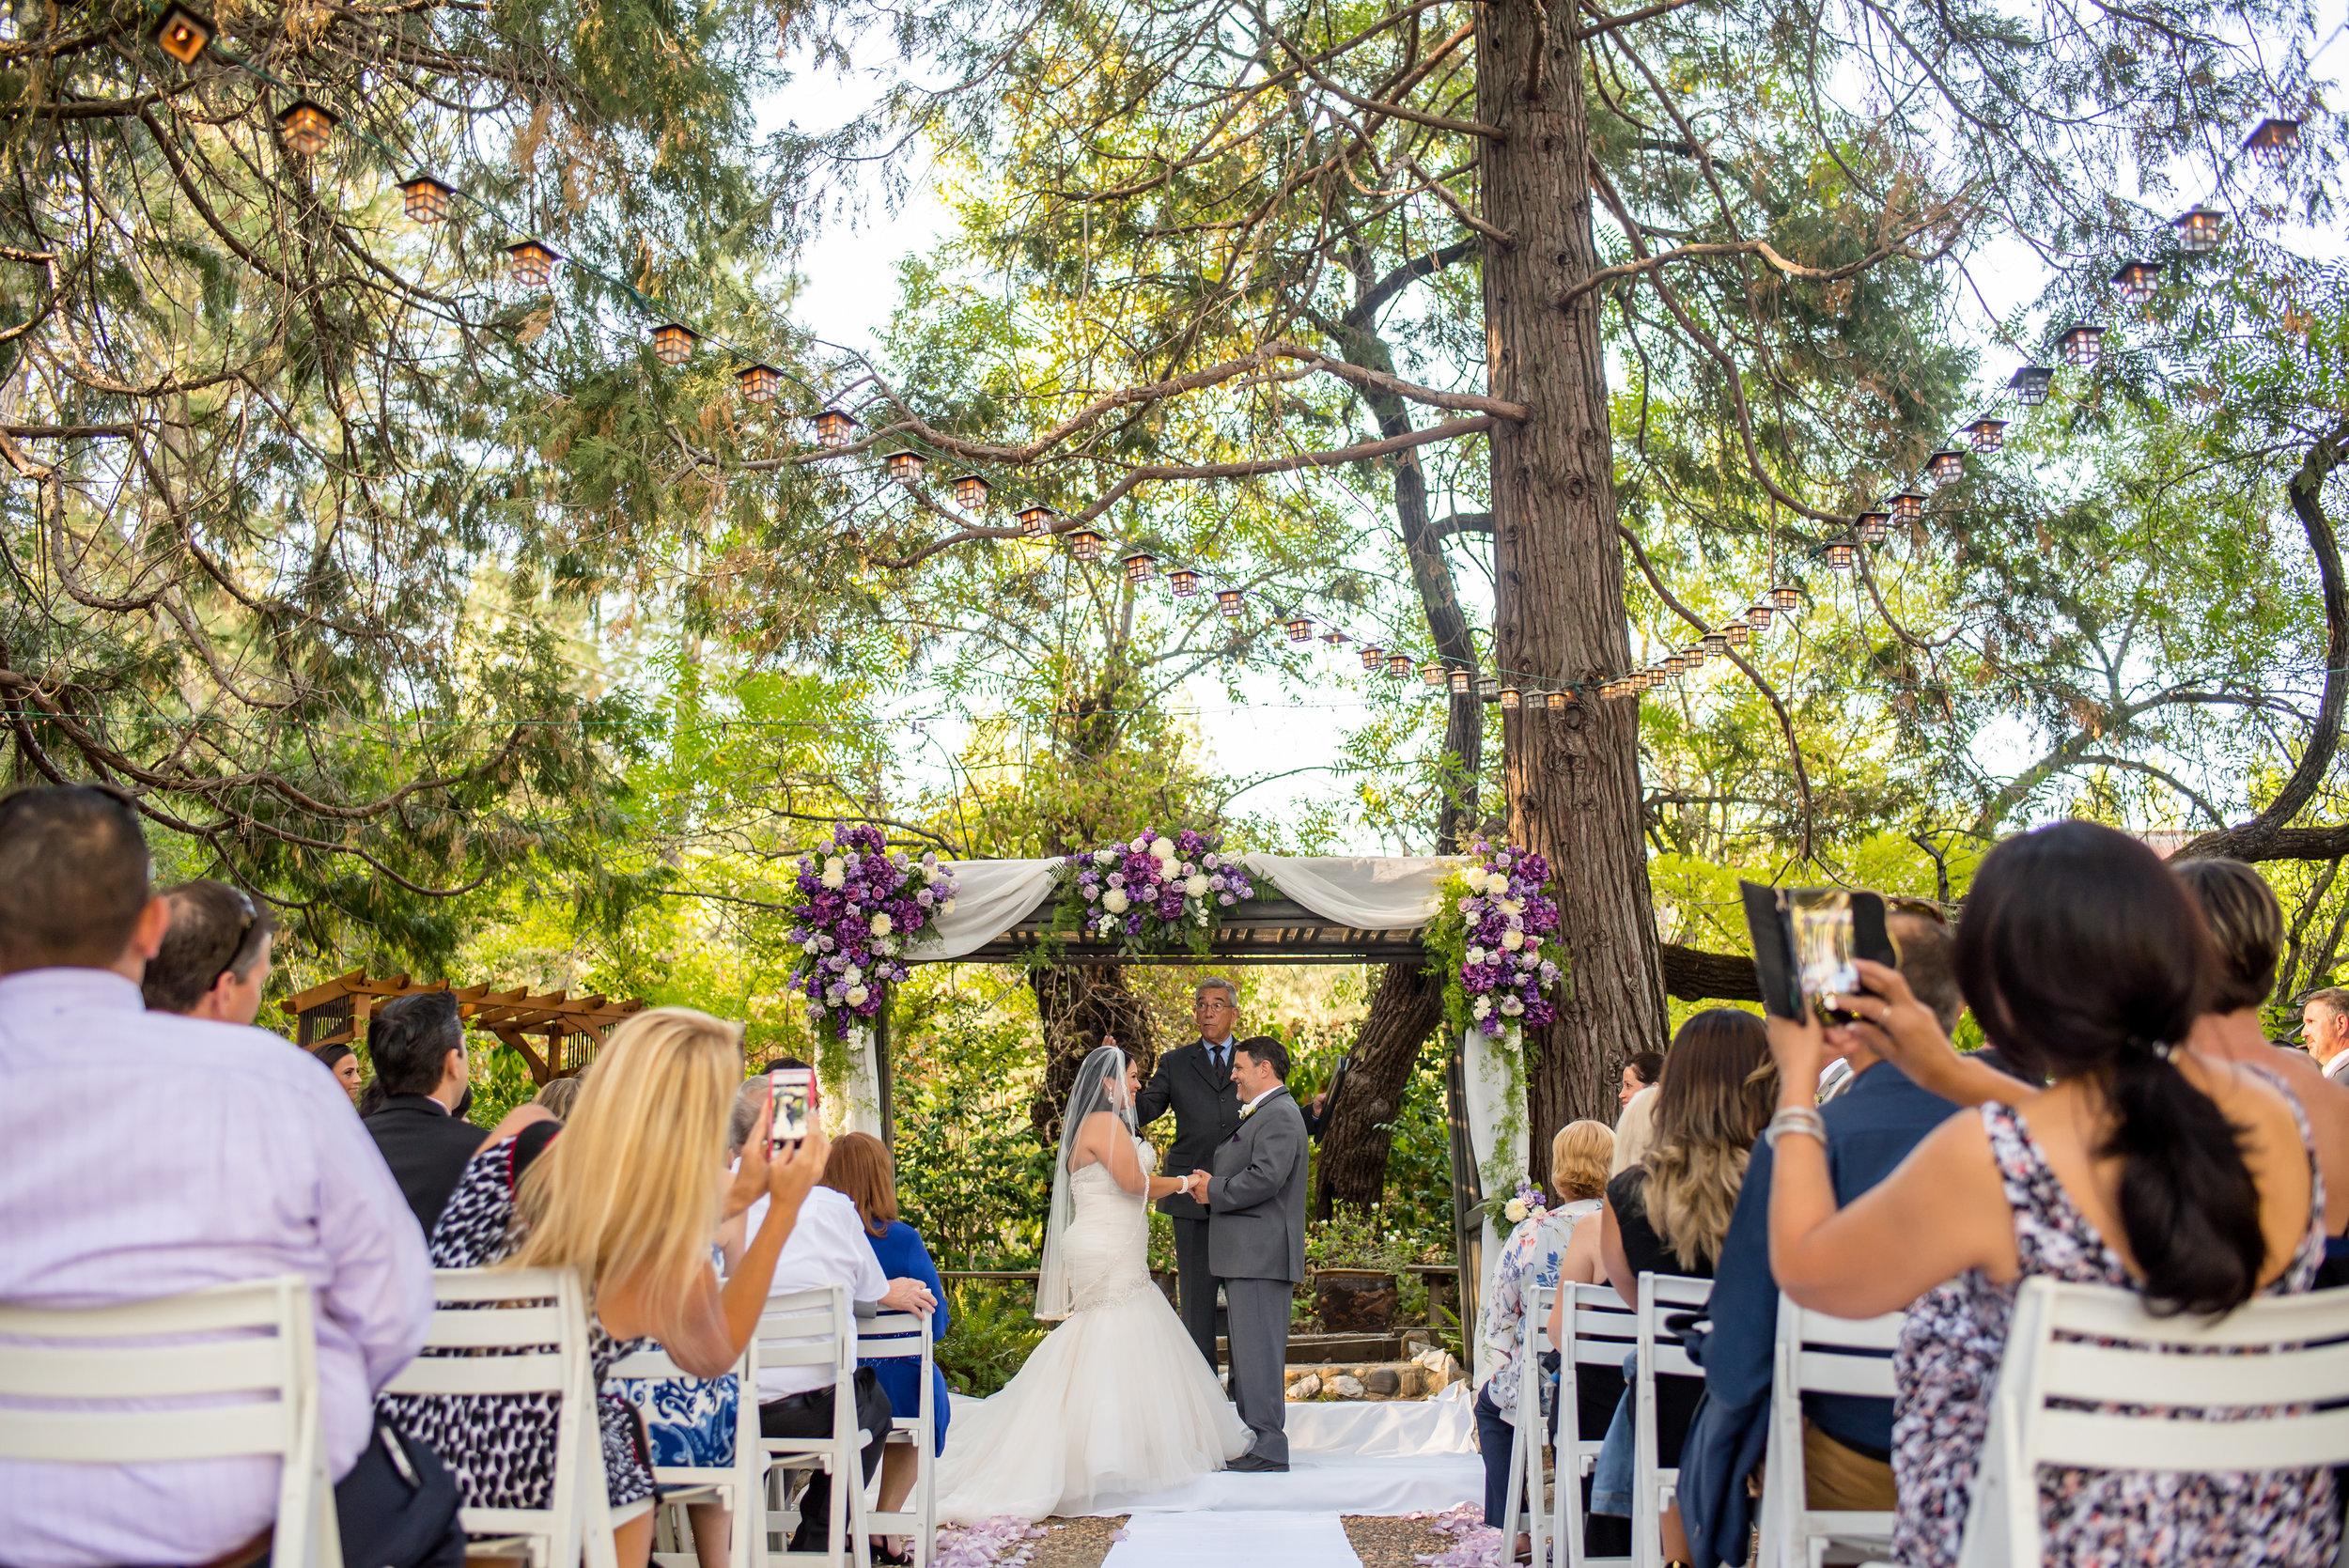 erika-seth-018-monte-verde-inn-sacramento-wedding-photographer-katherine-nicole-photography.JPG